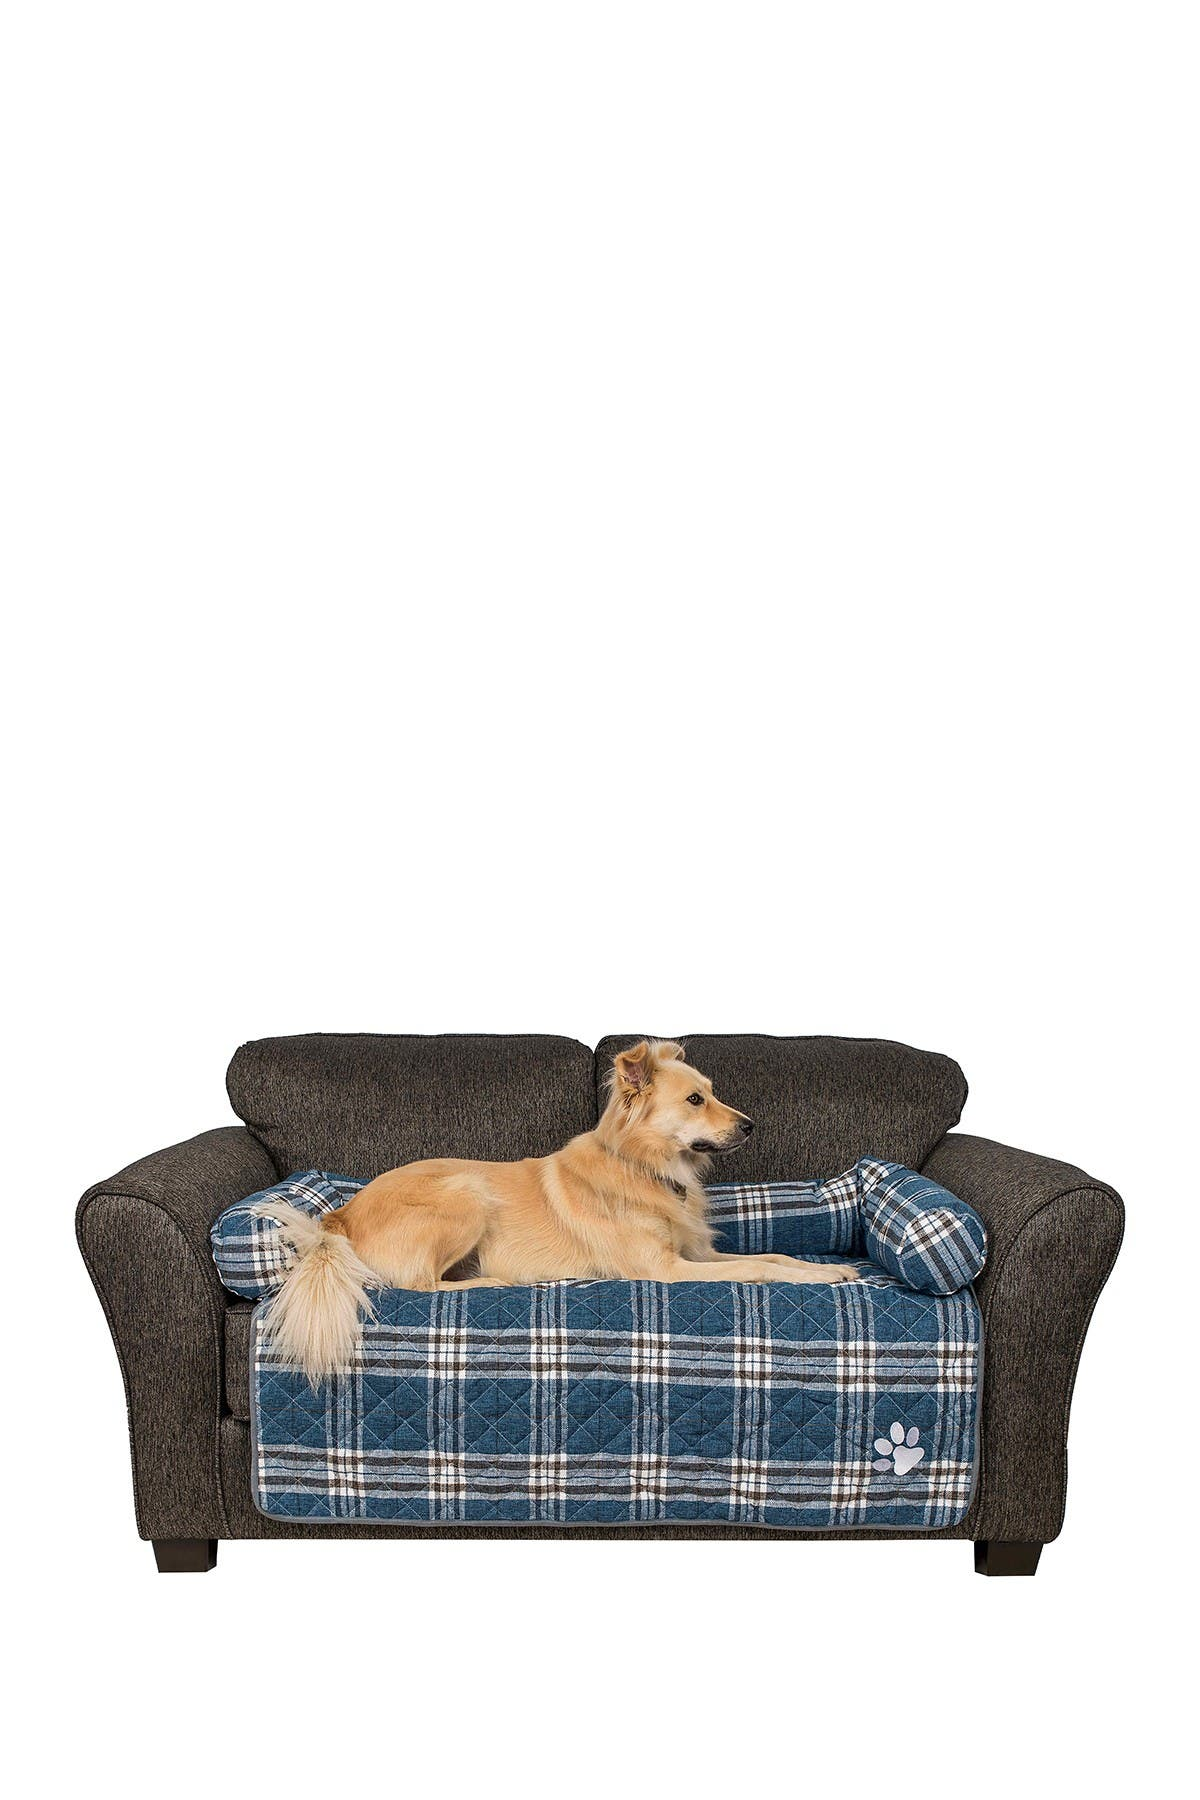 Image of Duck River Textile Hadley Reversible Pet Sofa Cover